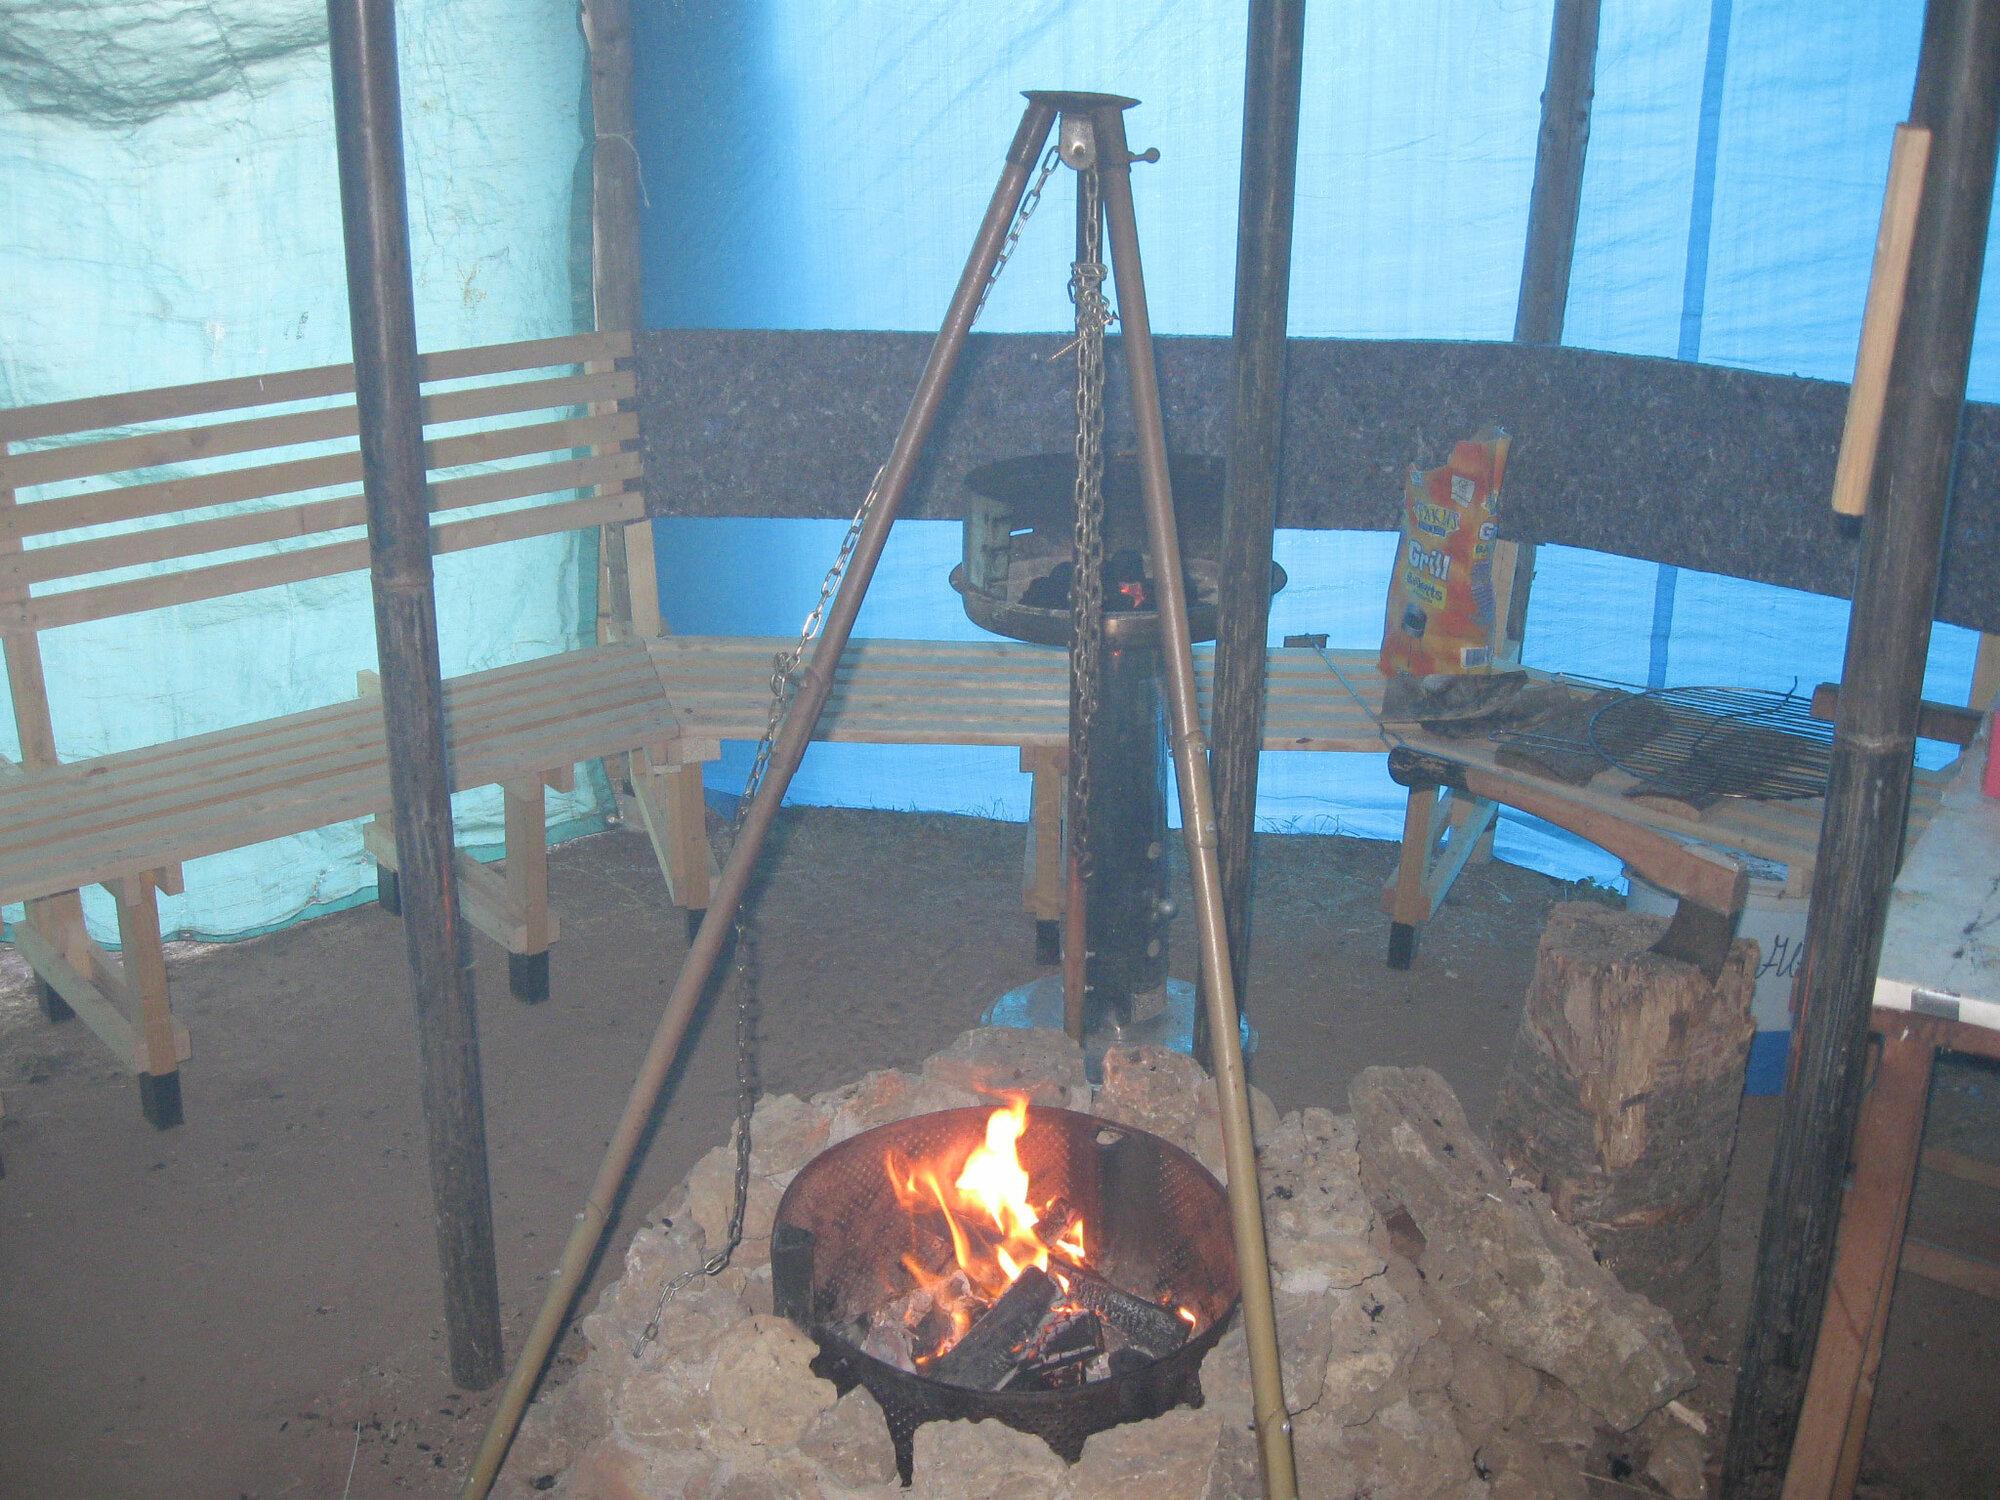 grillhütte10web.jpg